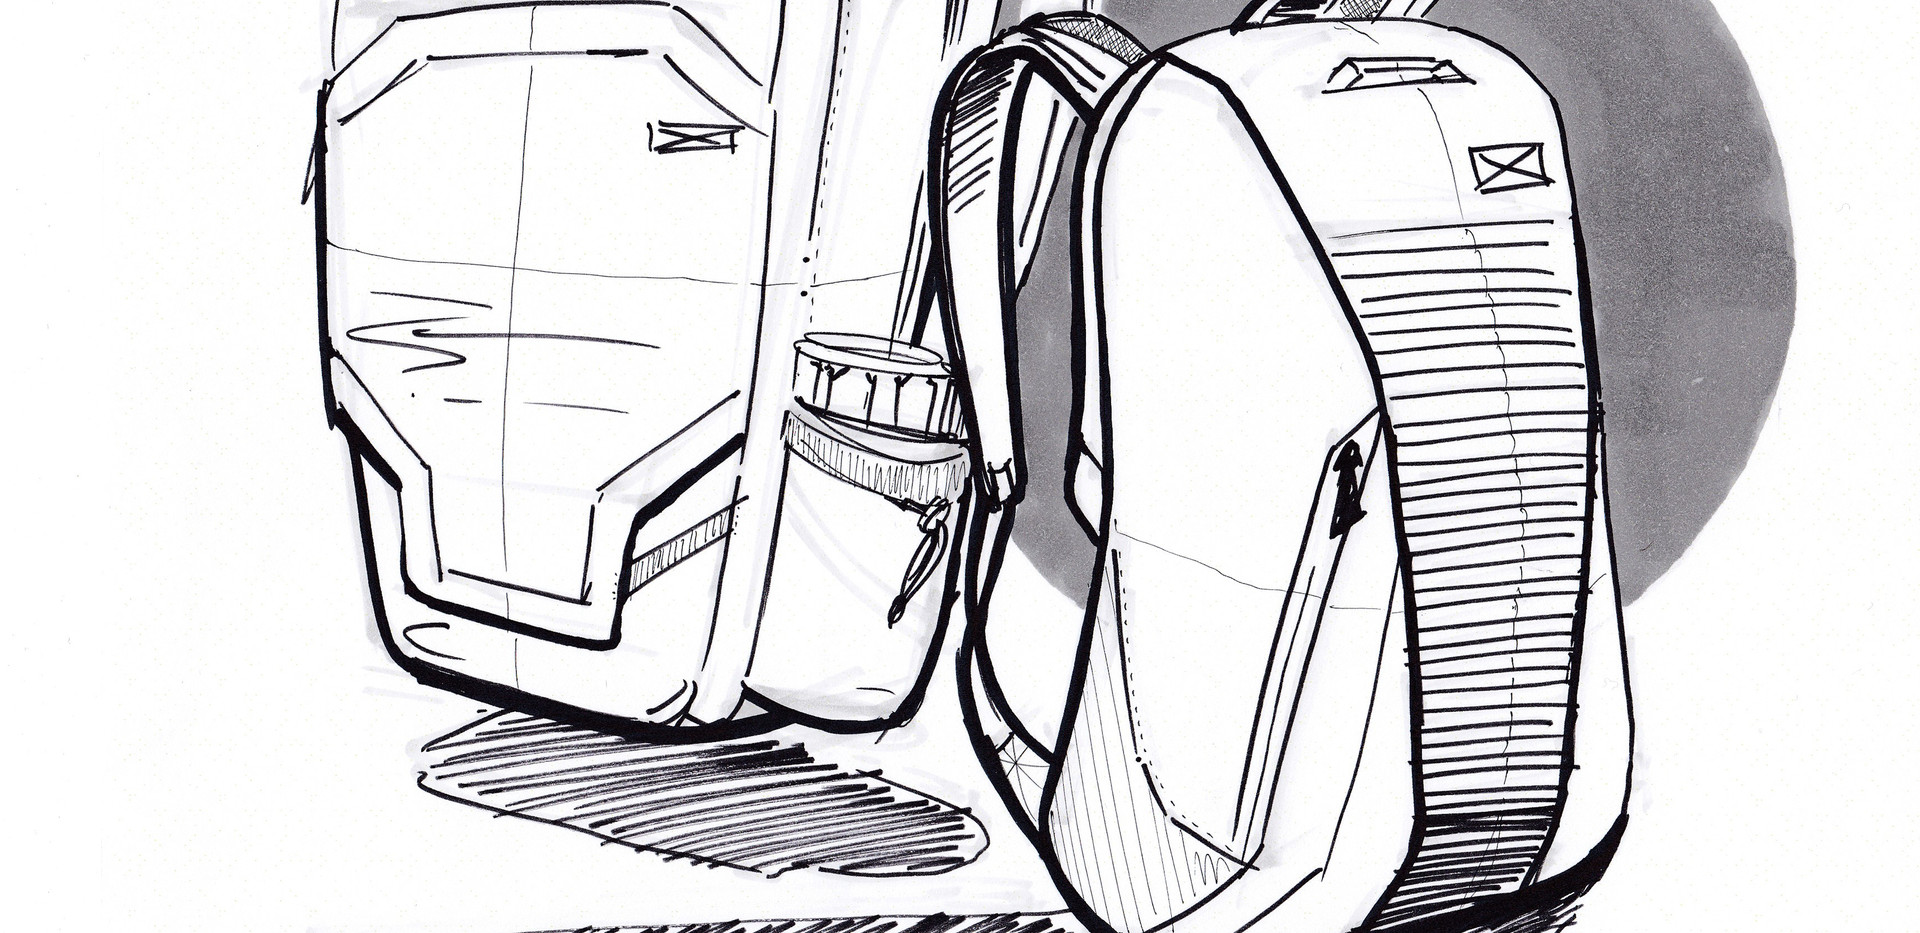 Bag_Sketches_2.jpg